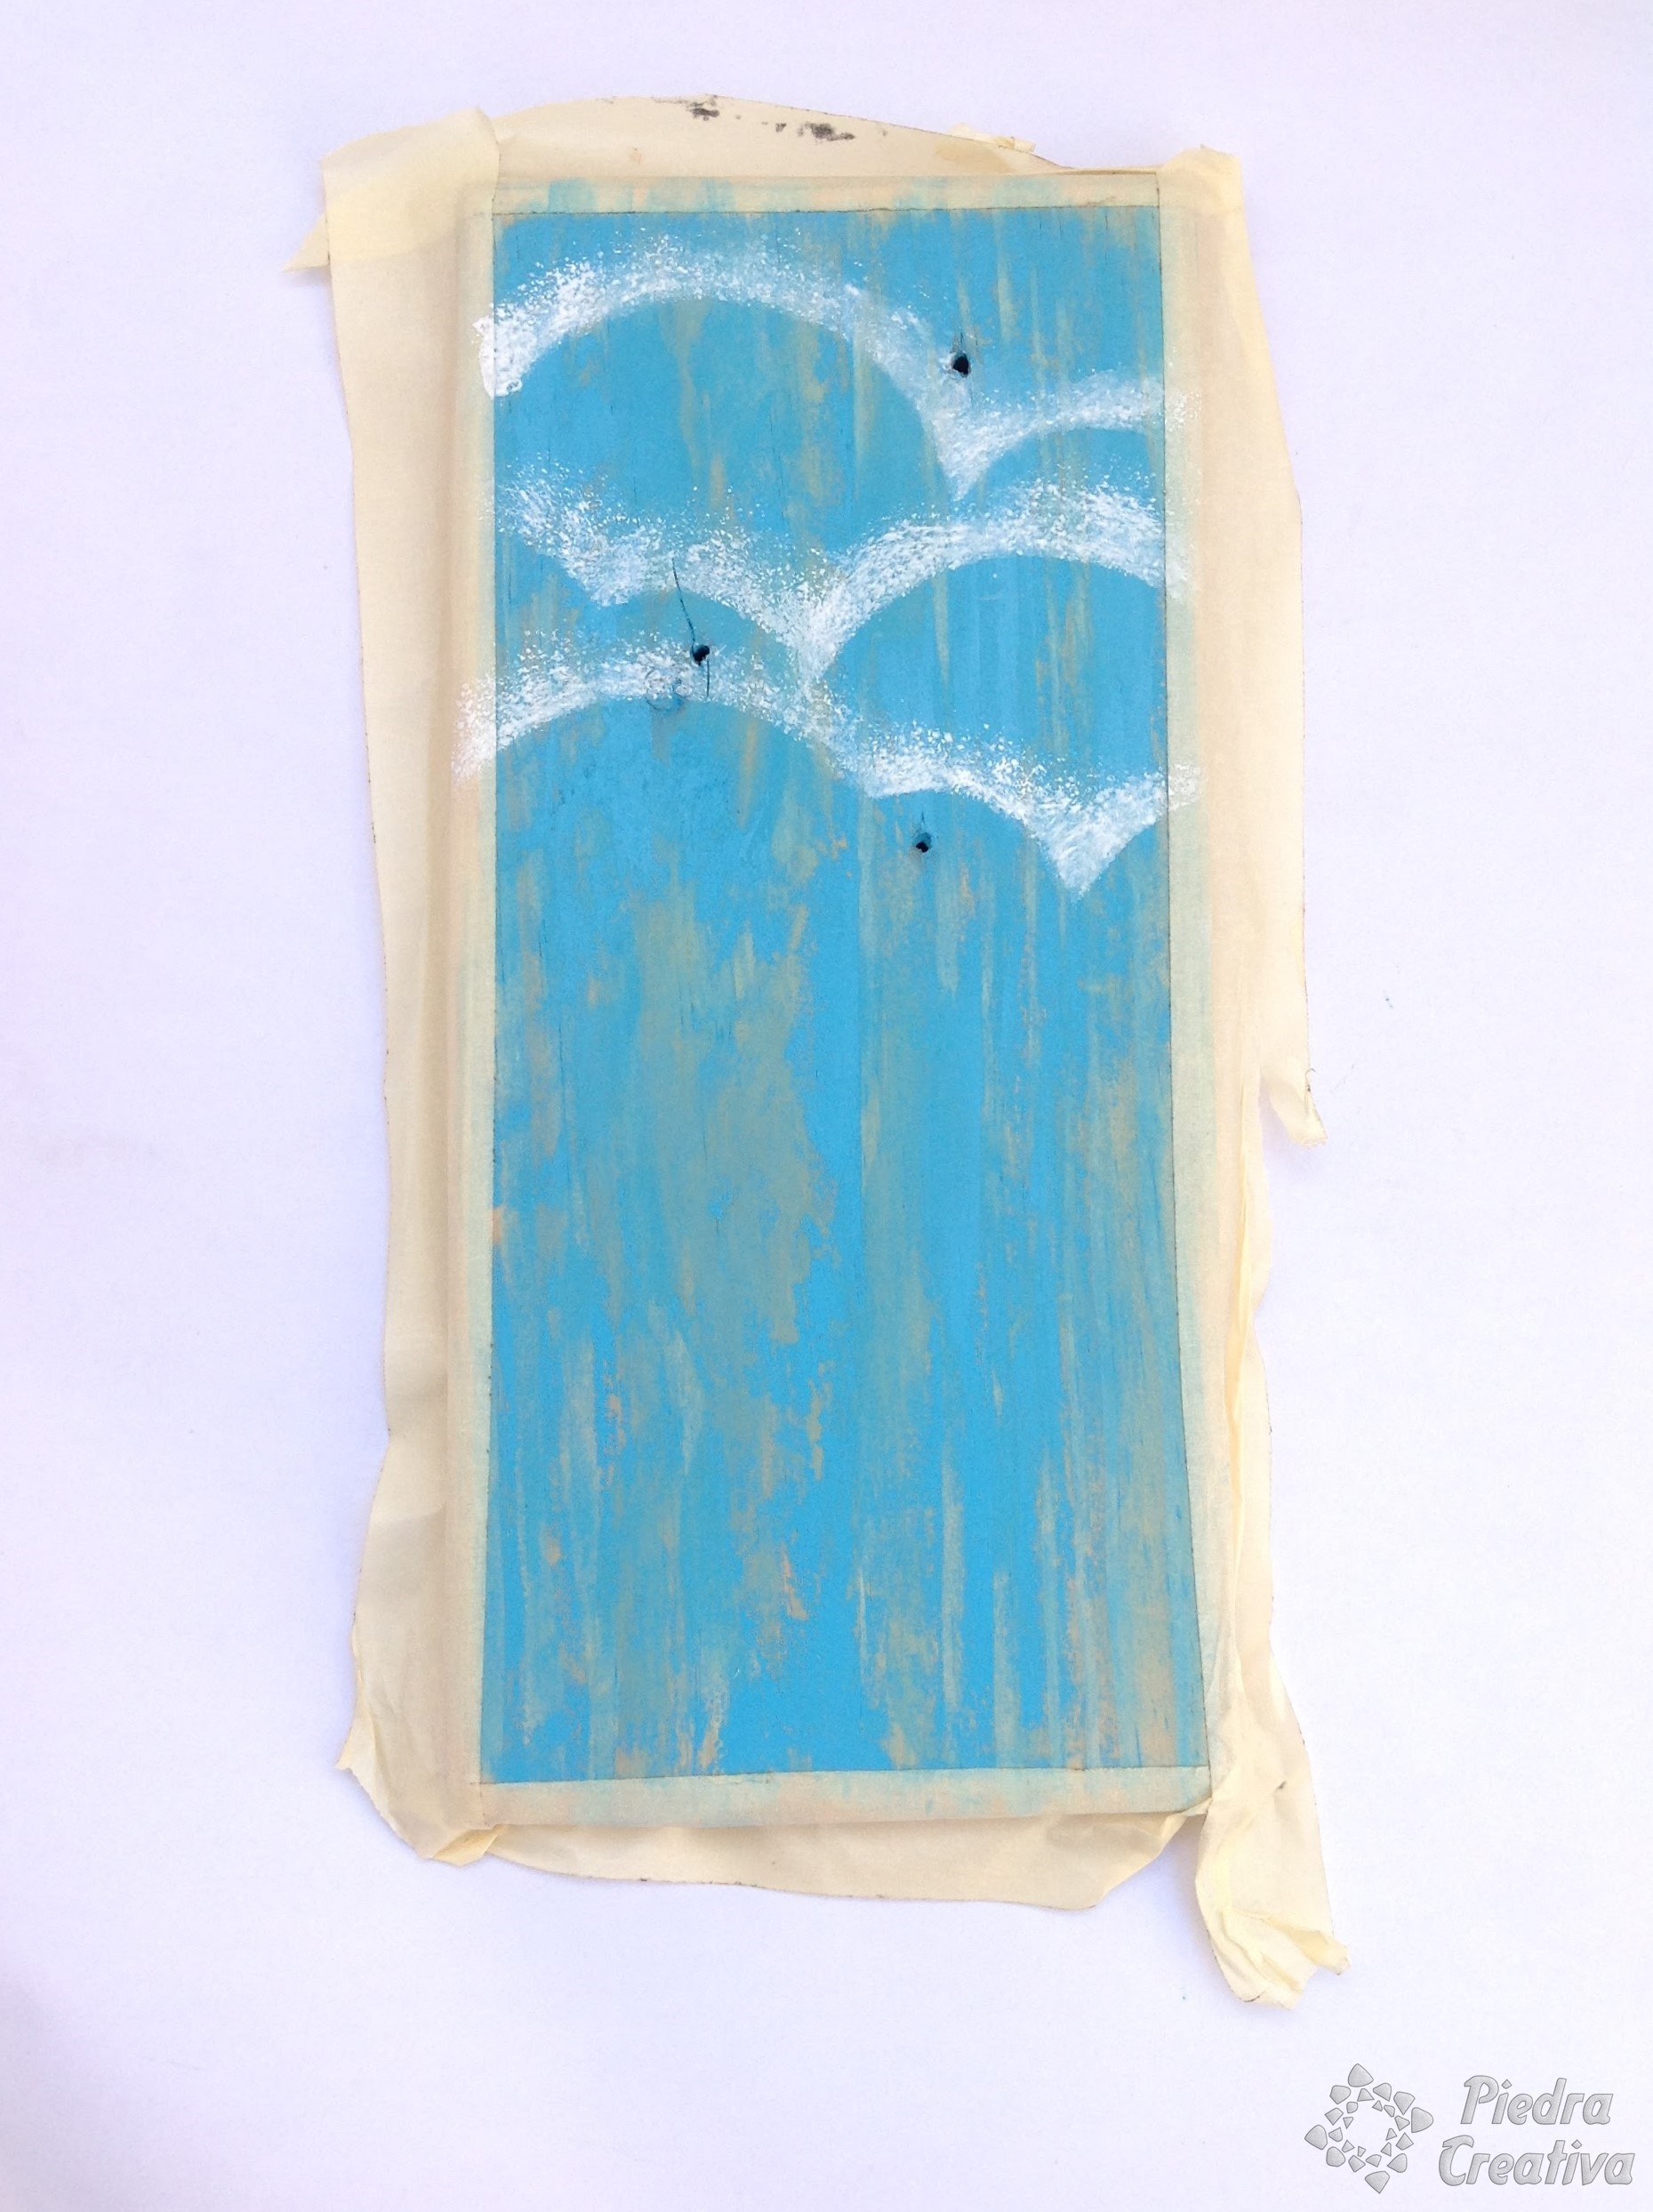 madera de como hacer flores pintadas con piedras